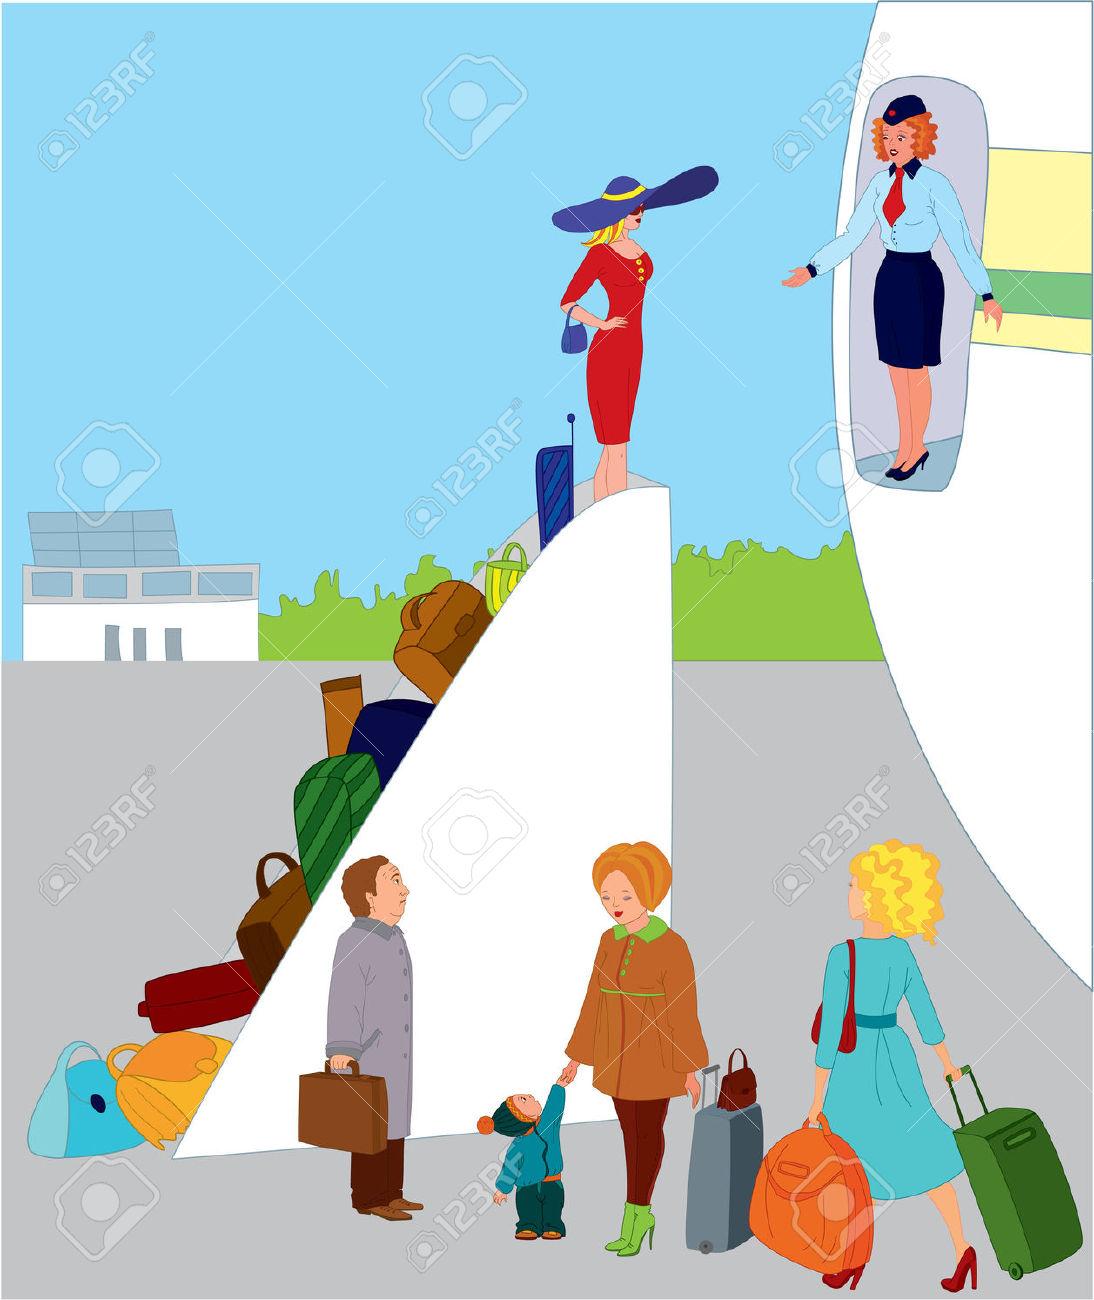 Airport clipart cartoon. Fly clipground flight attendant